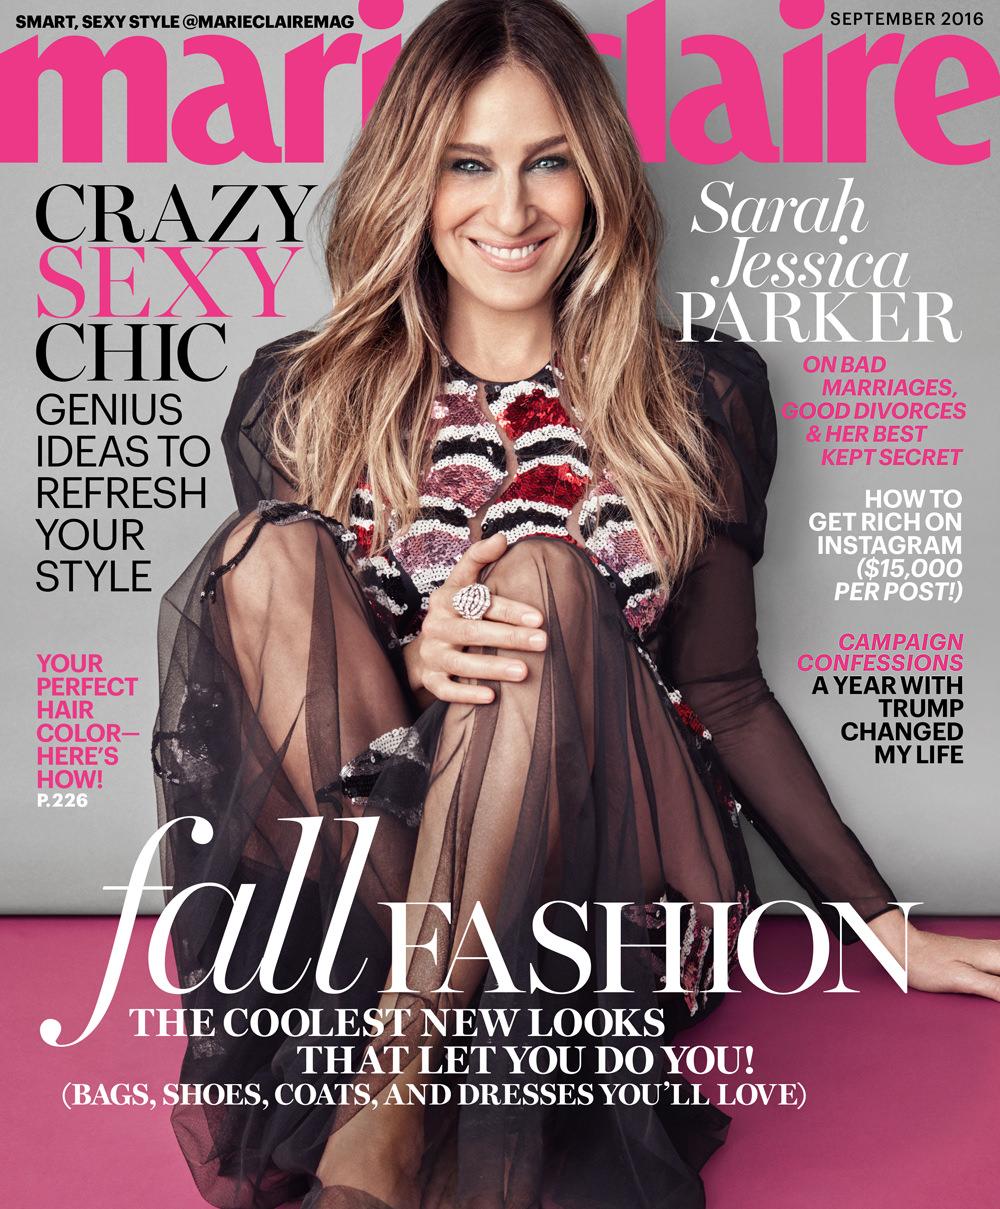 Sarah Jessica Parker Marie Claire Magazine September 2016 Issue Tom Lorenzo Site 1